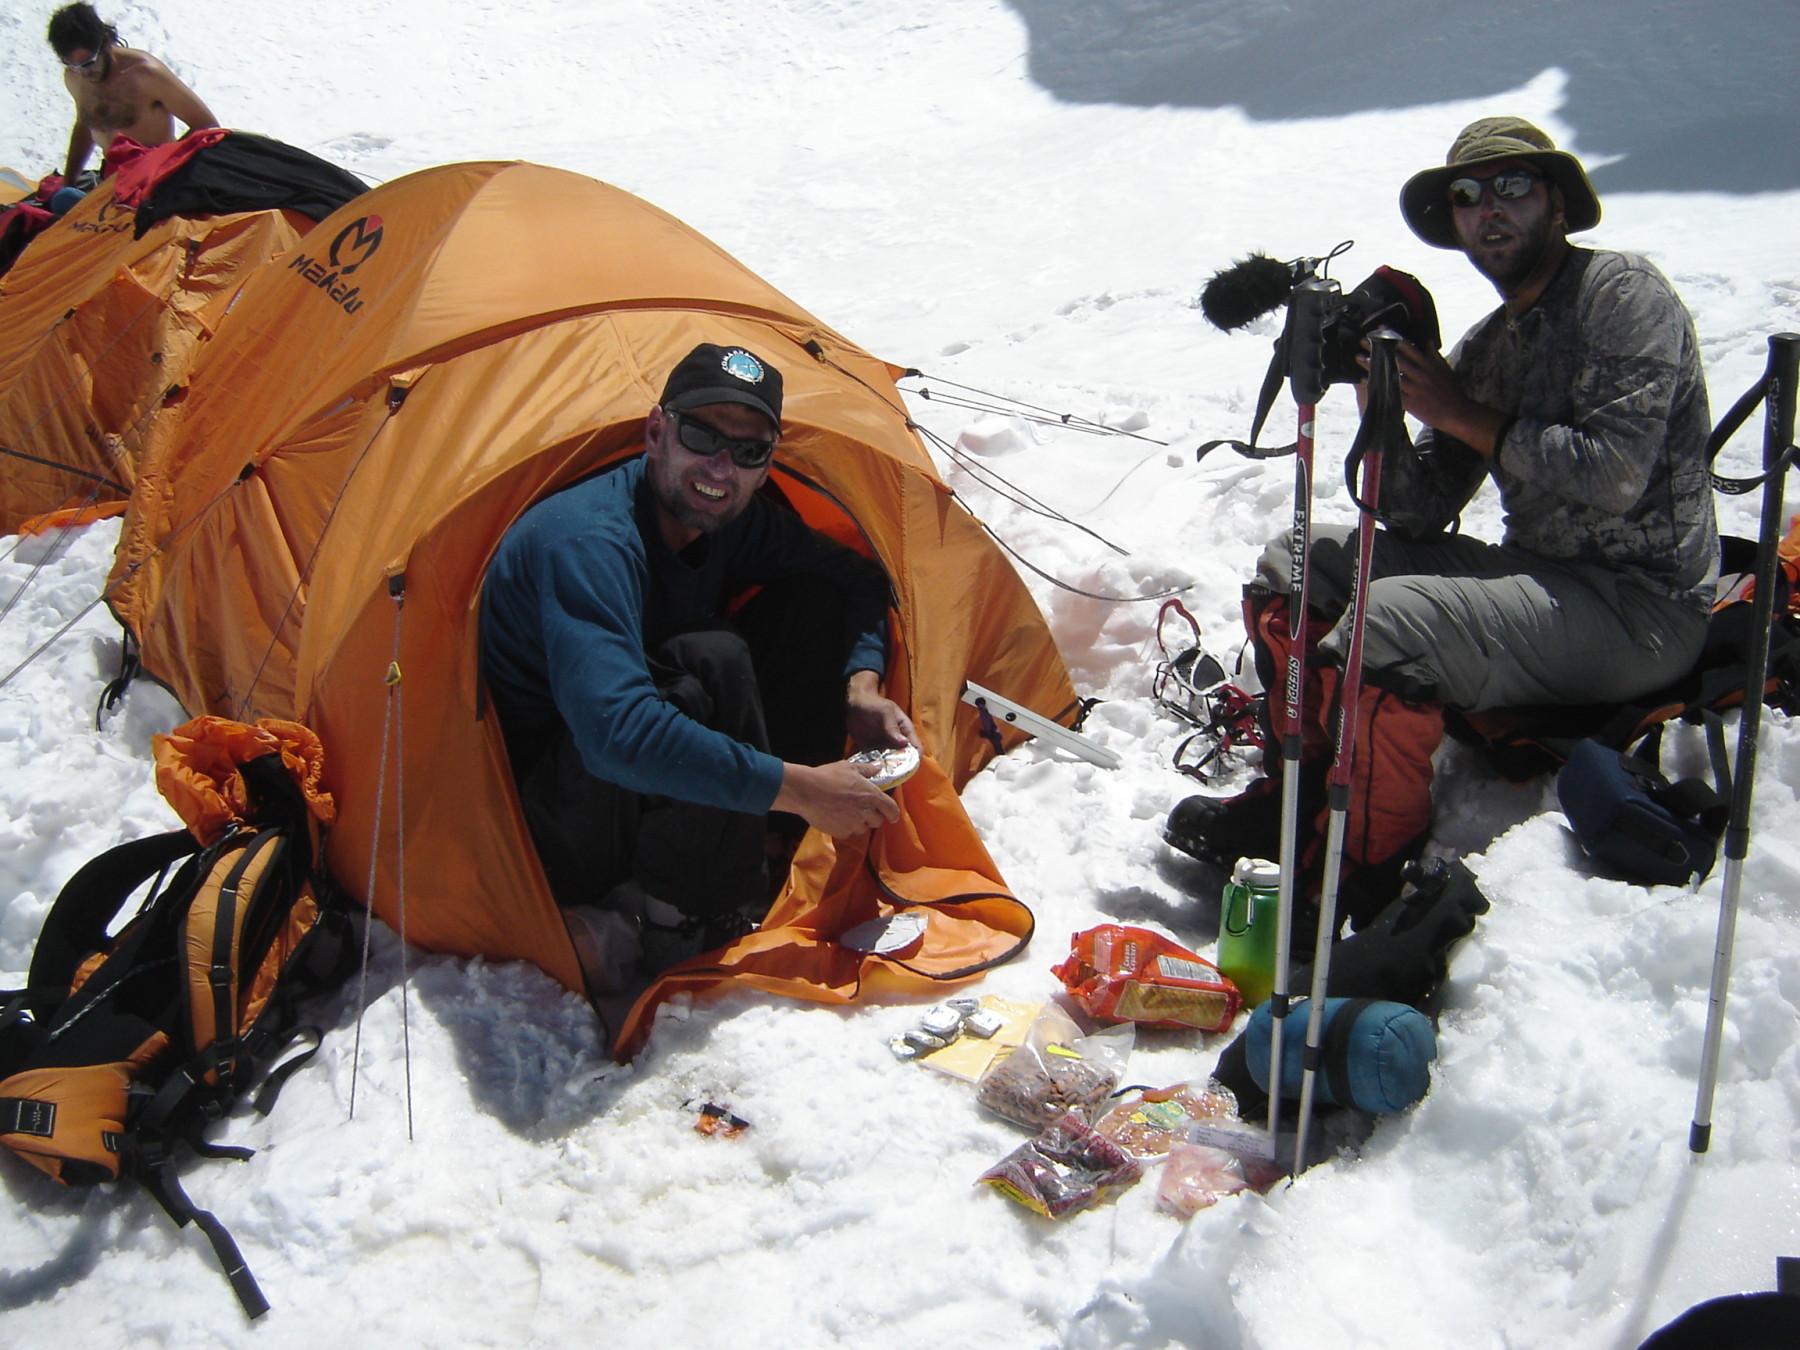 dhaulagiri-ascenso-a-la-montana-blanca-2-1800x1350